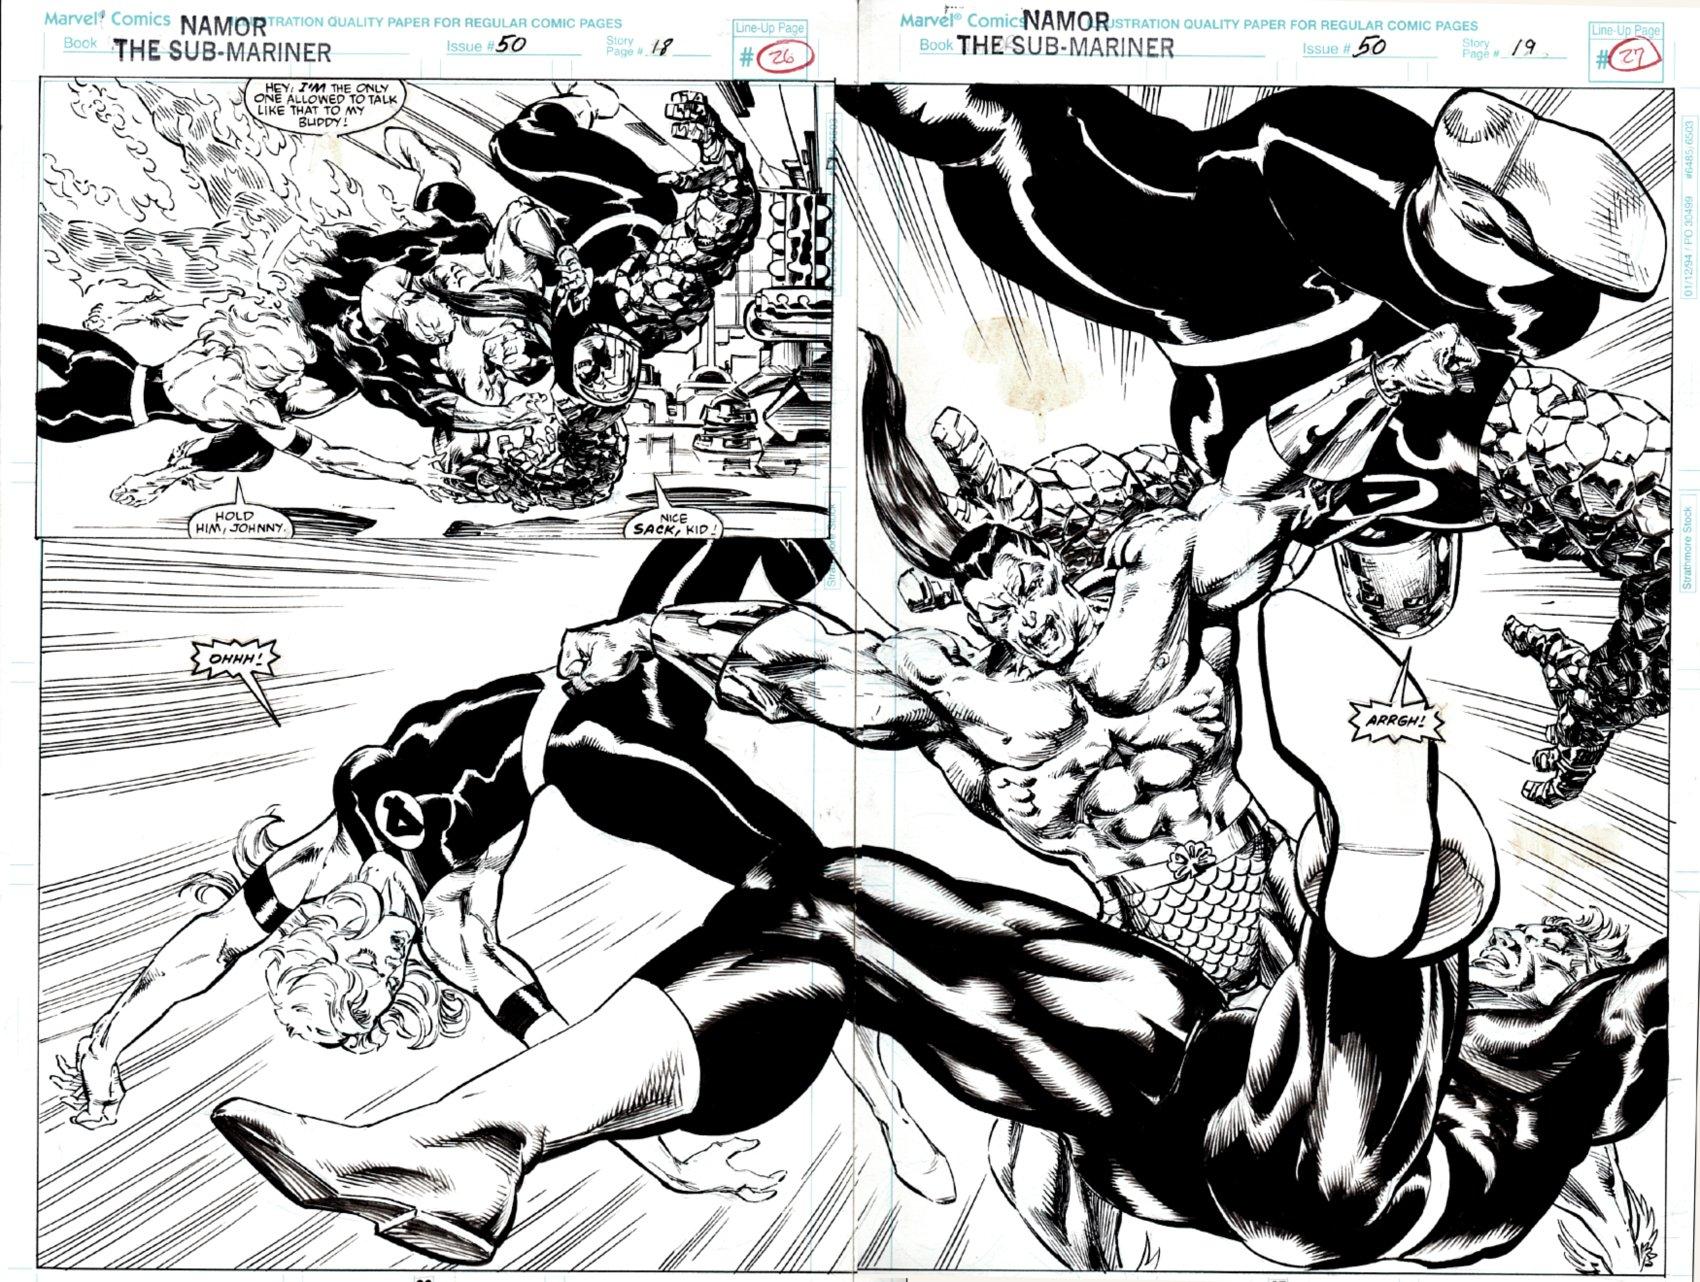 Namor, the Sub-Mariner #50 p 18-19 Double Spread Splash (FF / SUBBY BATTLE!) 1994